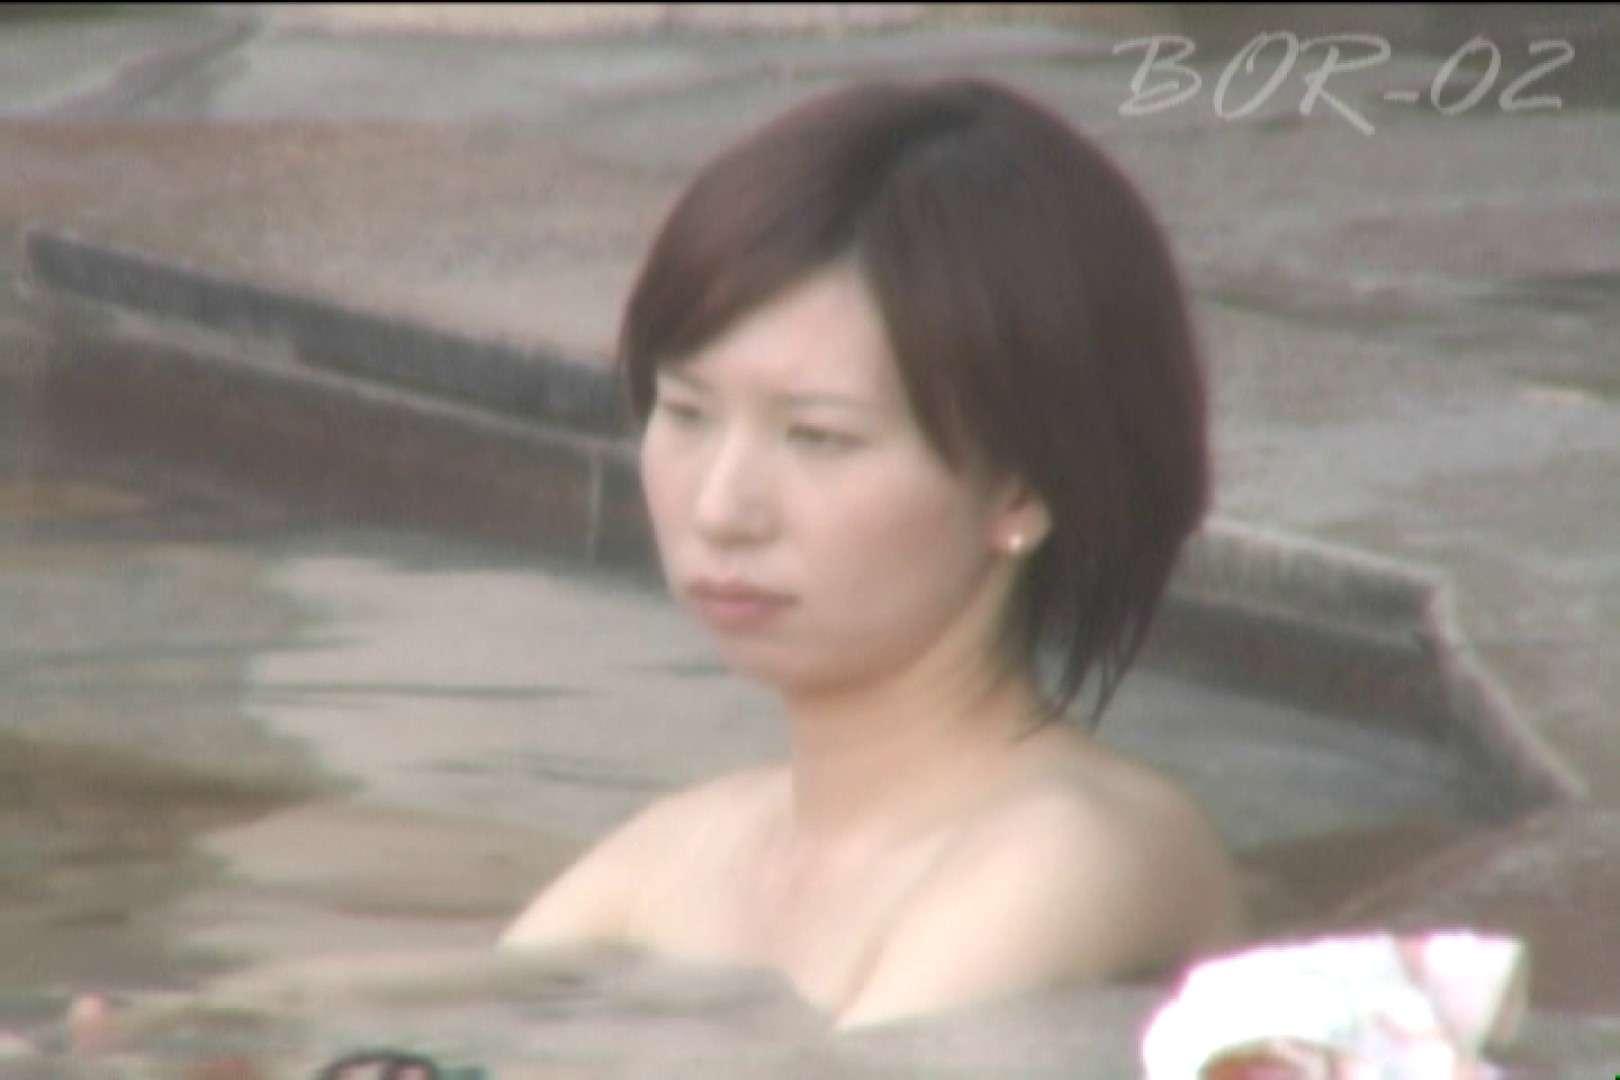 Aquaな露天風呂Vol.475 露天 | OLセックス  96画像 16